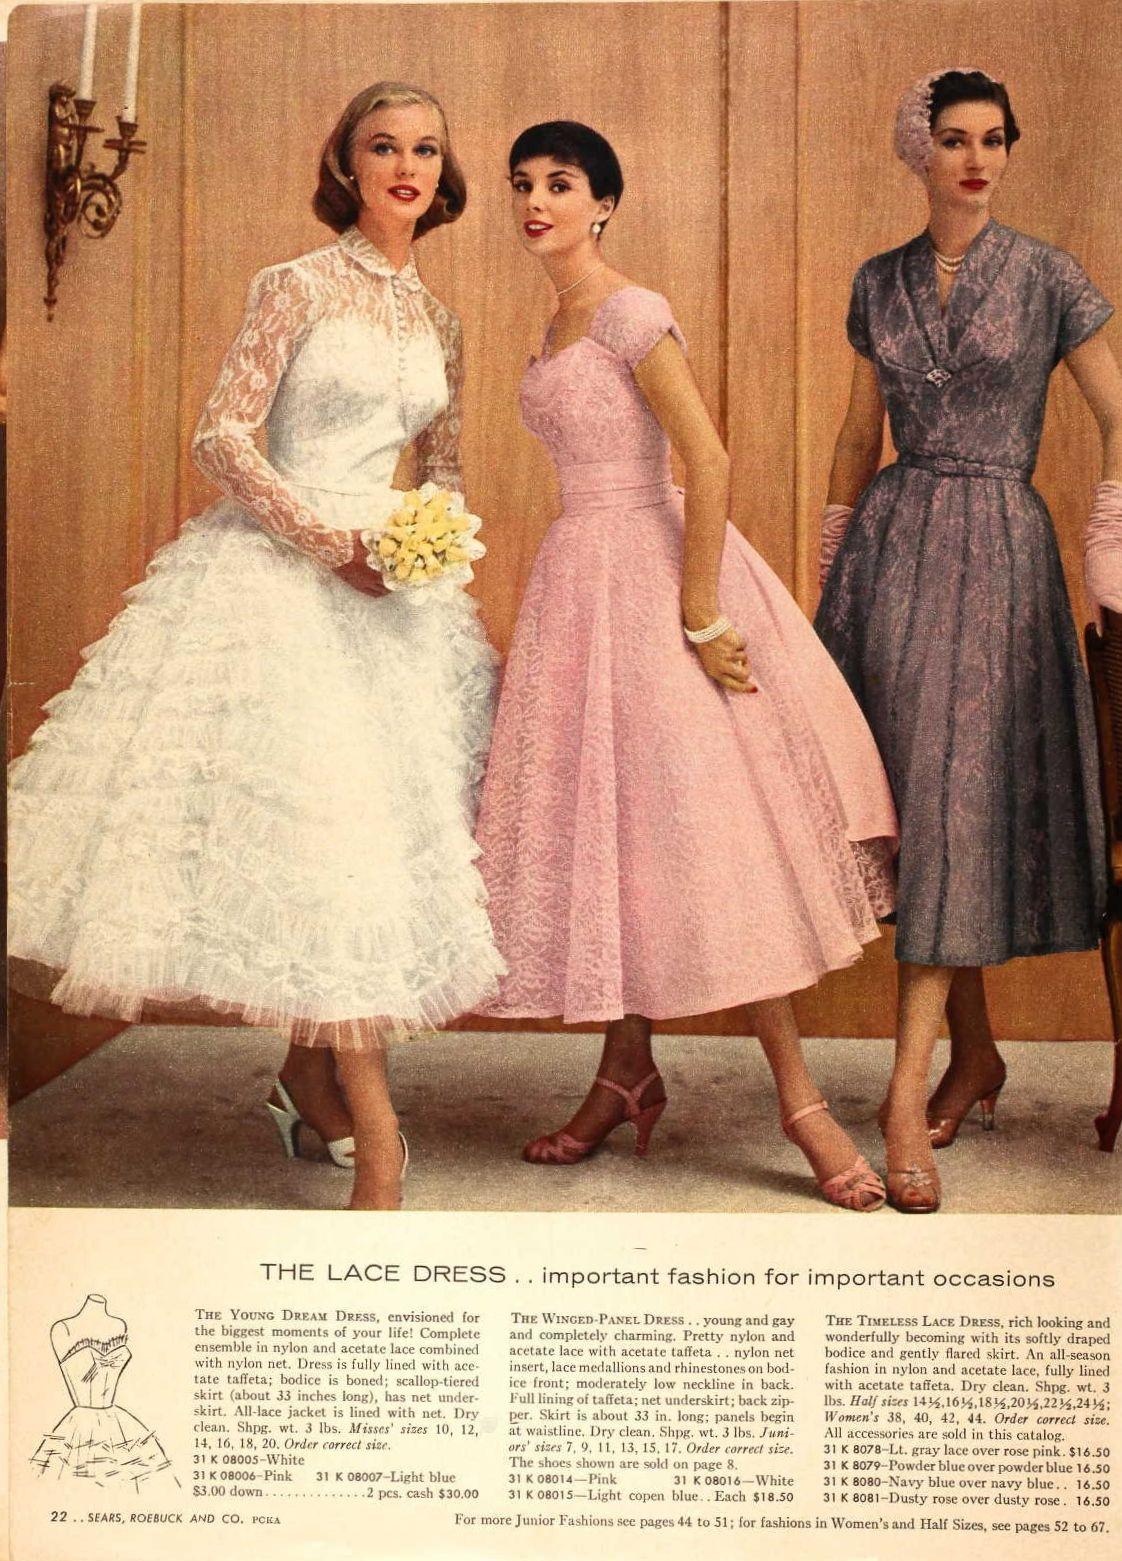 Mega Post Of Fashions From The 1957 Sears Catalogs Enjoy Fifties Fashion Vintage Dresses Petticoat Dress